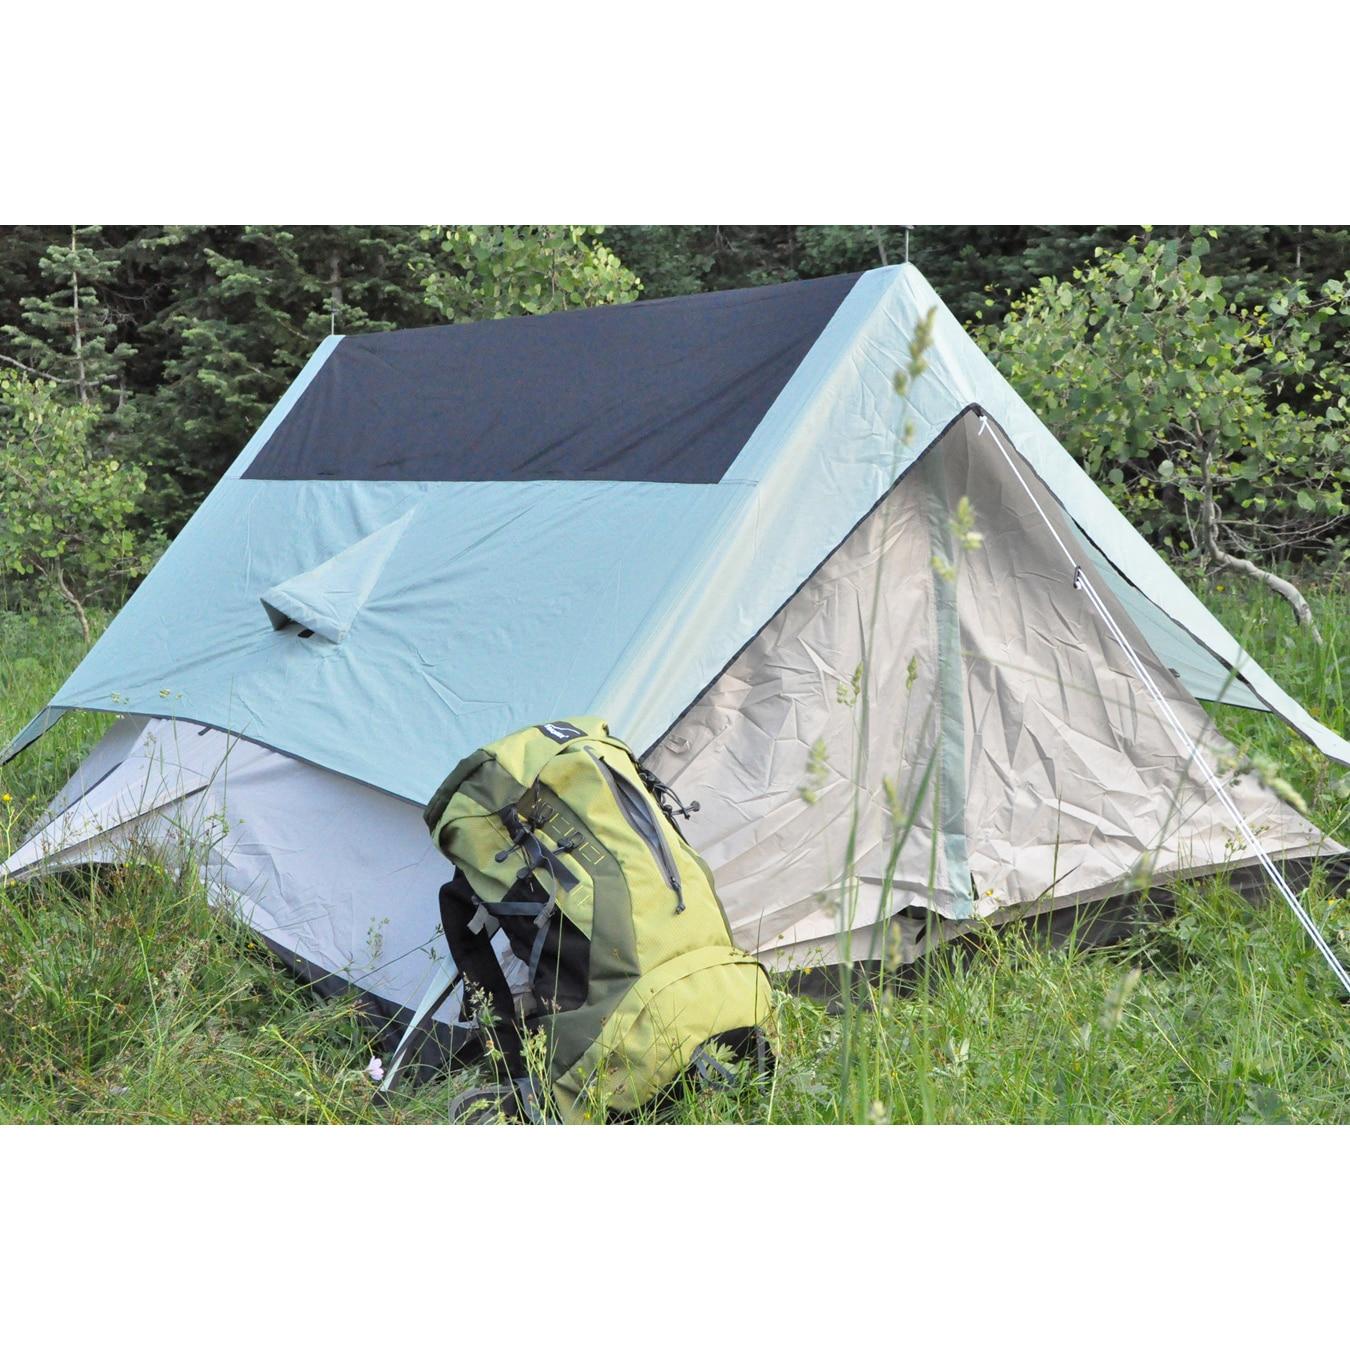 Black Pines Sports '3 Pines' Three-person Tent